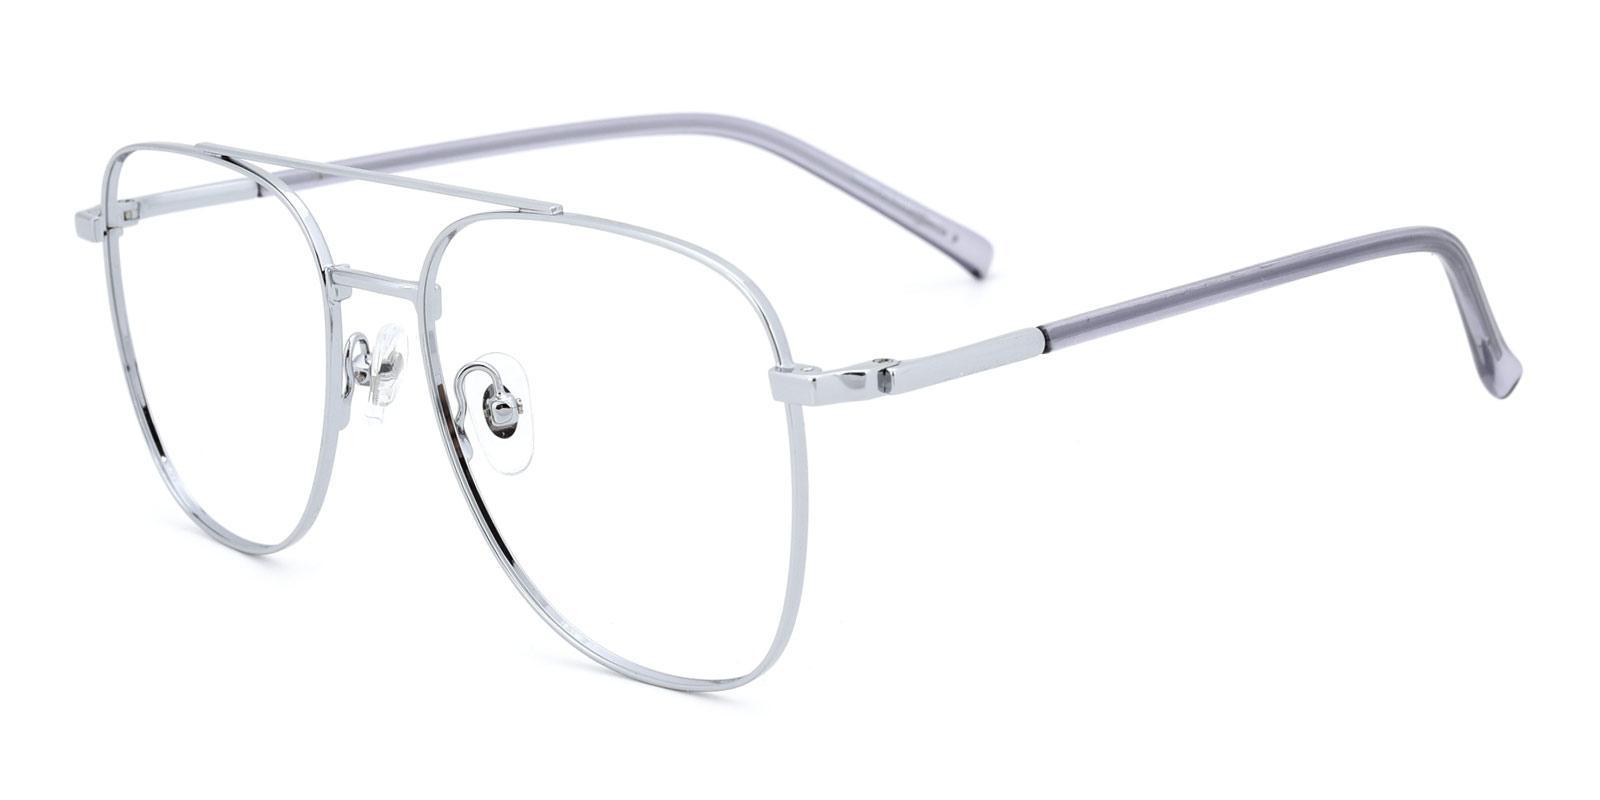 Defender-Silver-Aviator / Square-Metal-Eyeglasses-detail